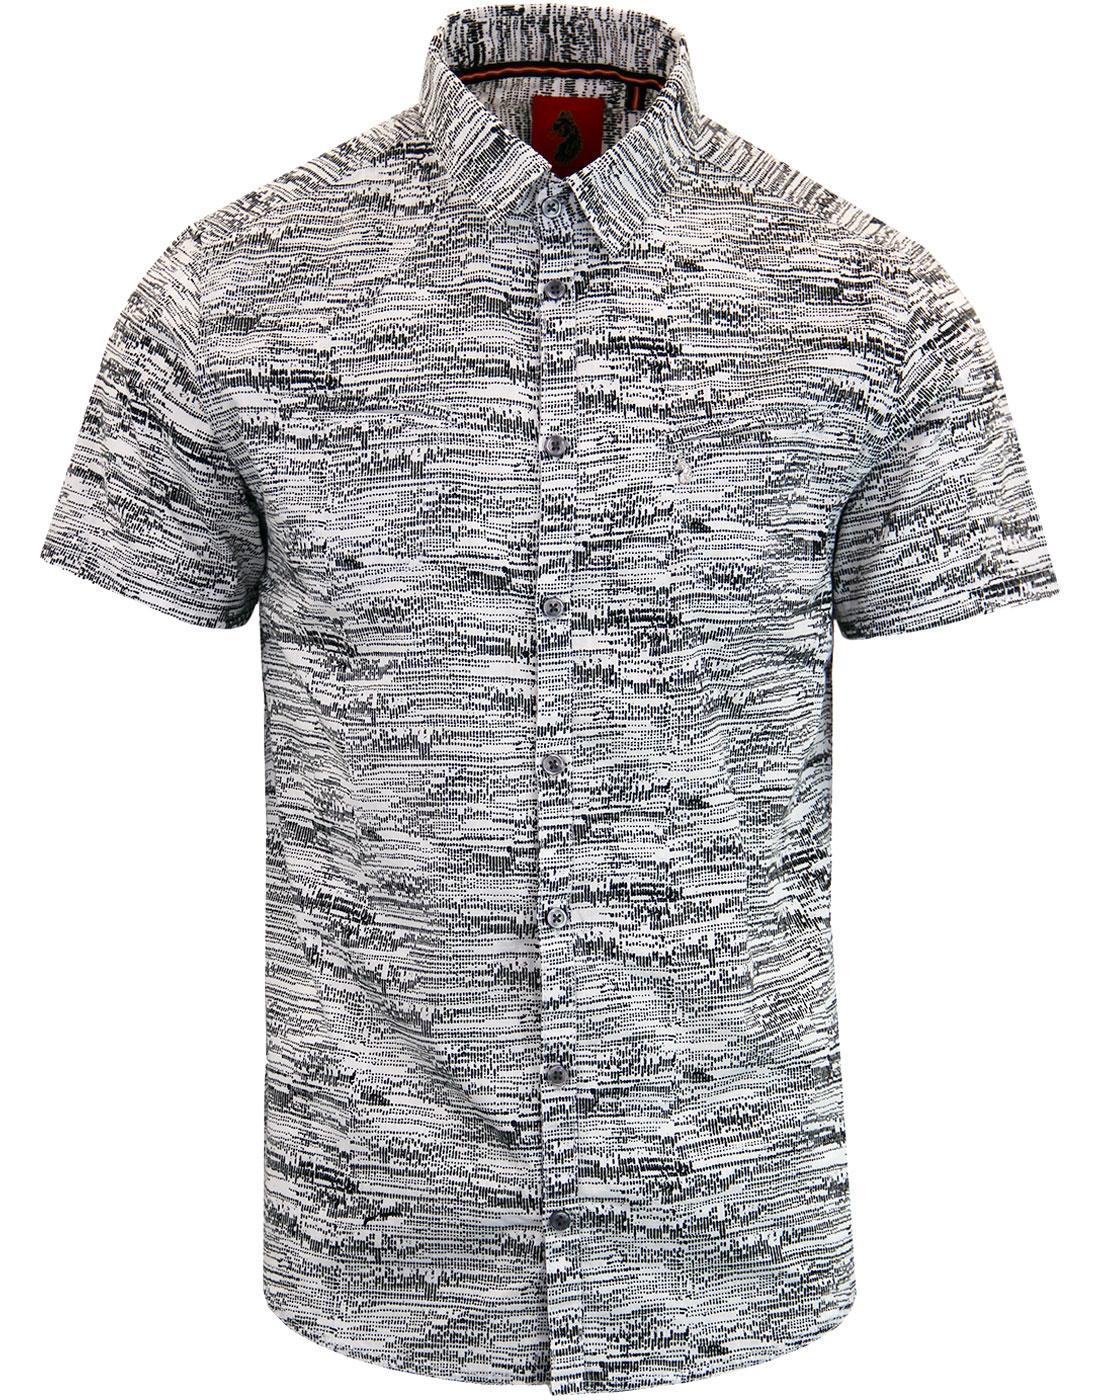 Gomez LUKE Men's Retro Abstract Print S/S Shirt